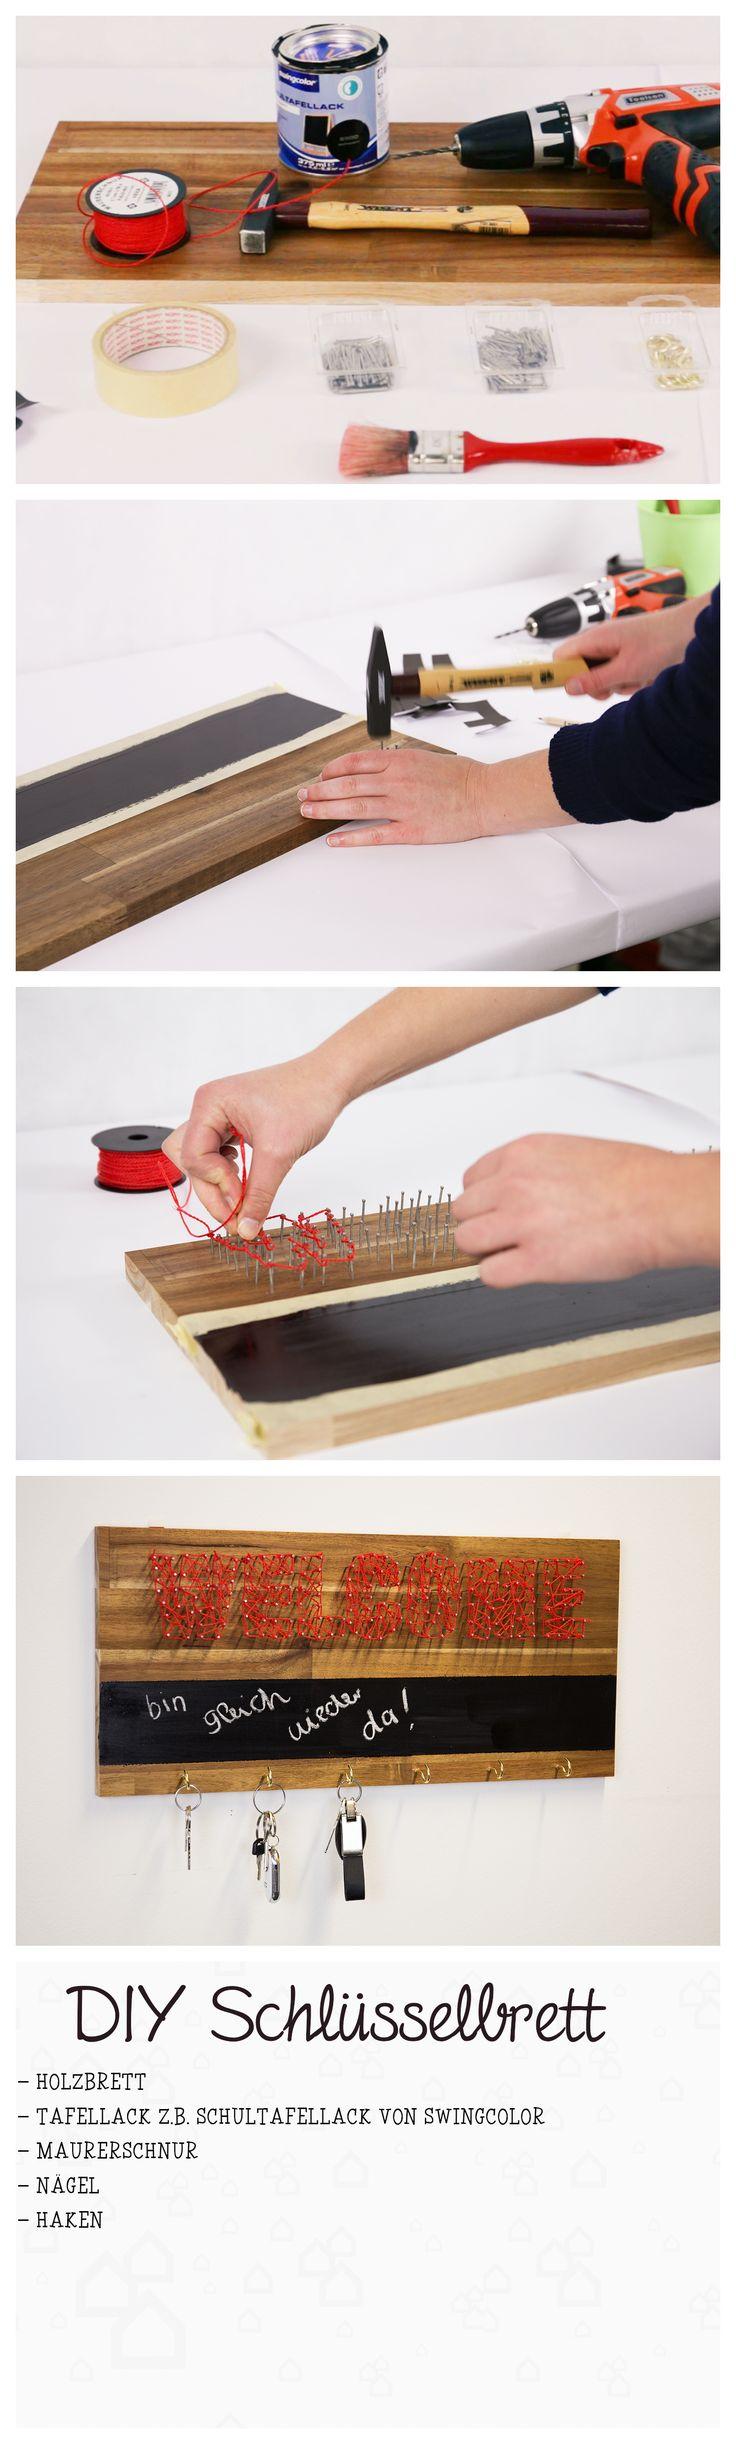 60 best DIYs mit Beton images on Pinterest | Cement, Craft and ...